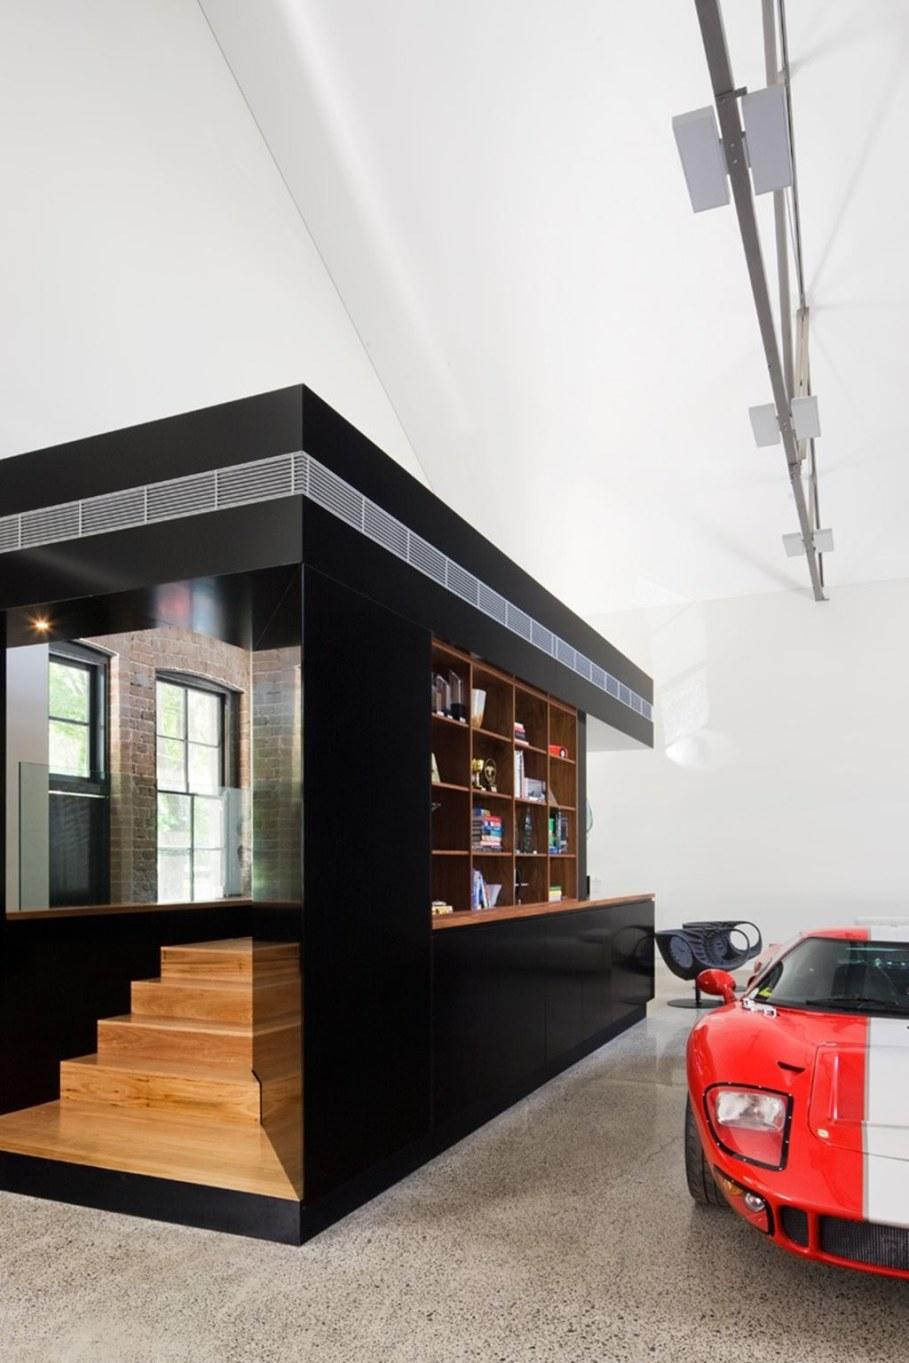 Grand loft house in Australia by Corben Architects studio - Living room 4